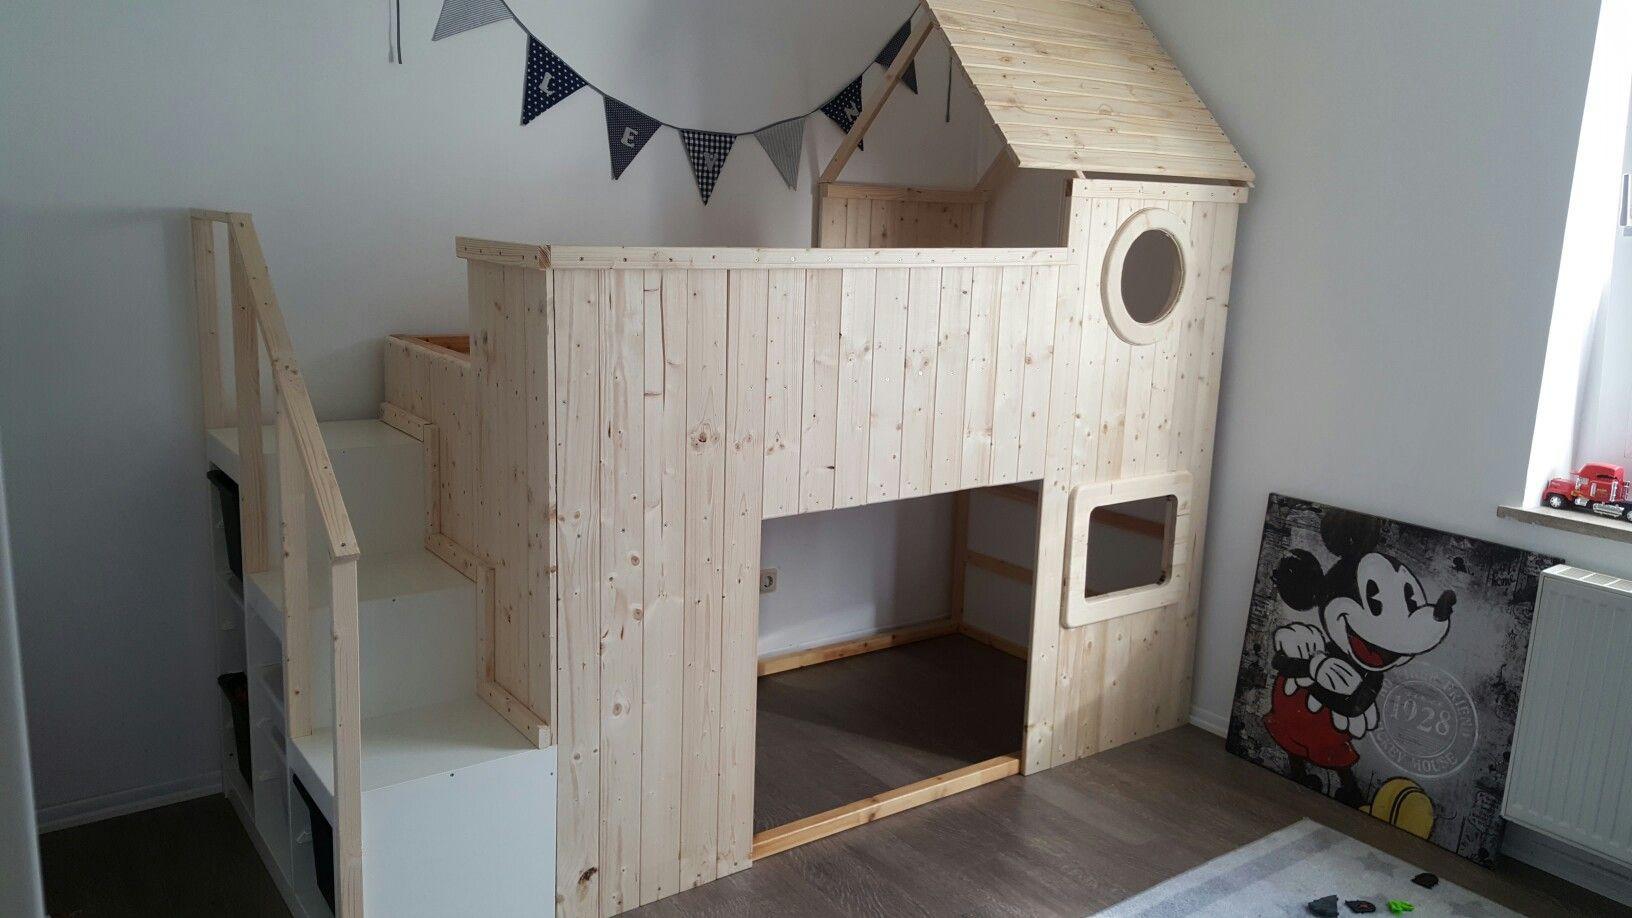 Full Size of Kura Hack Bunk Bed Storage Ikea Stairs House Montessori Slide Double Underneath Diy Girls In 2019 3a Anleitung Beste Mbelideen Wohnzimmer Kura Hack